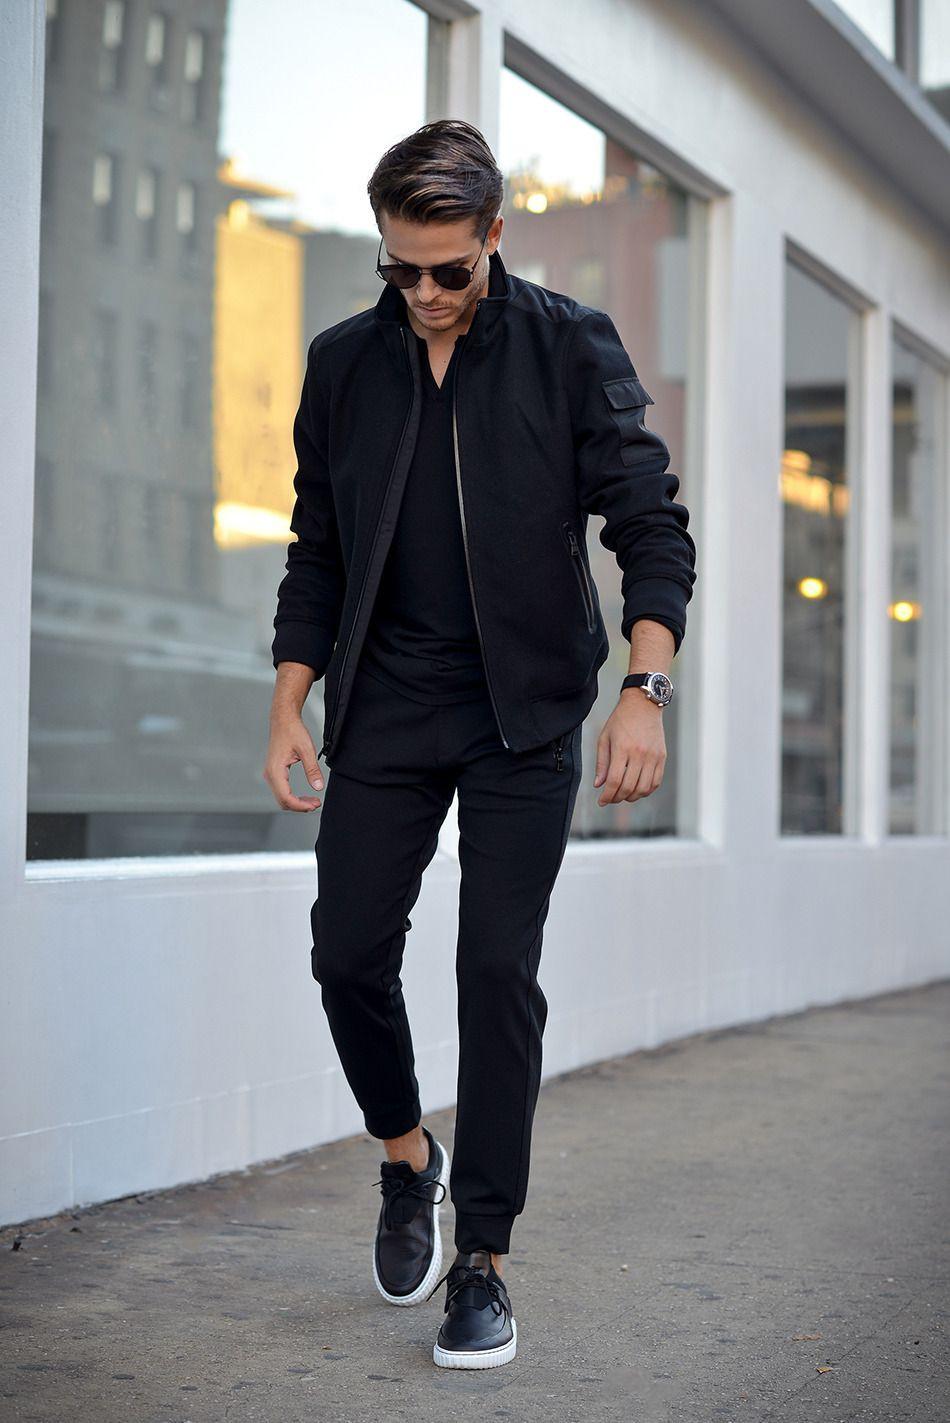 Trendy clothing ideas black style men, leather jacket, street fashion, flight jacket, casual wear